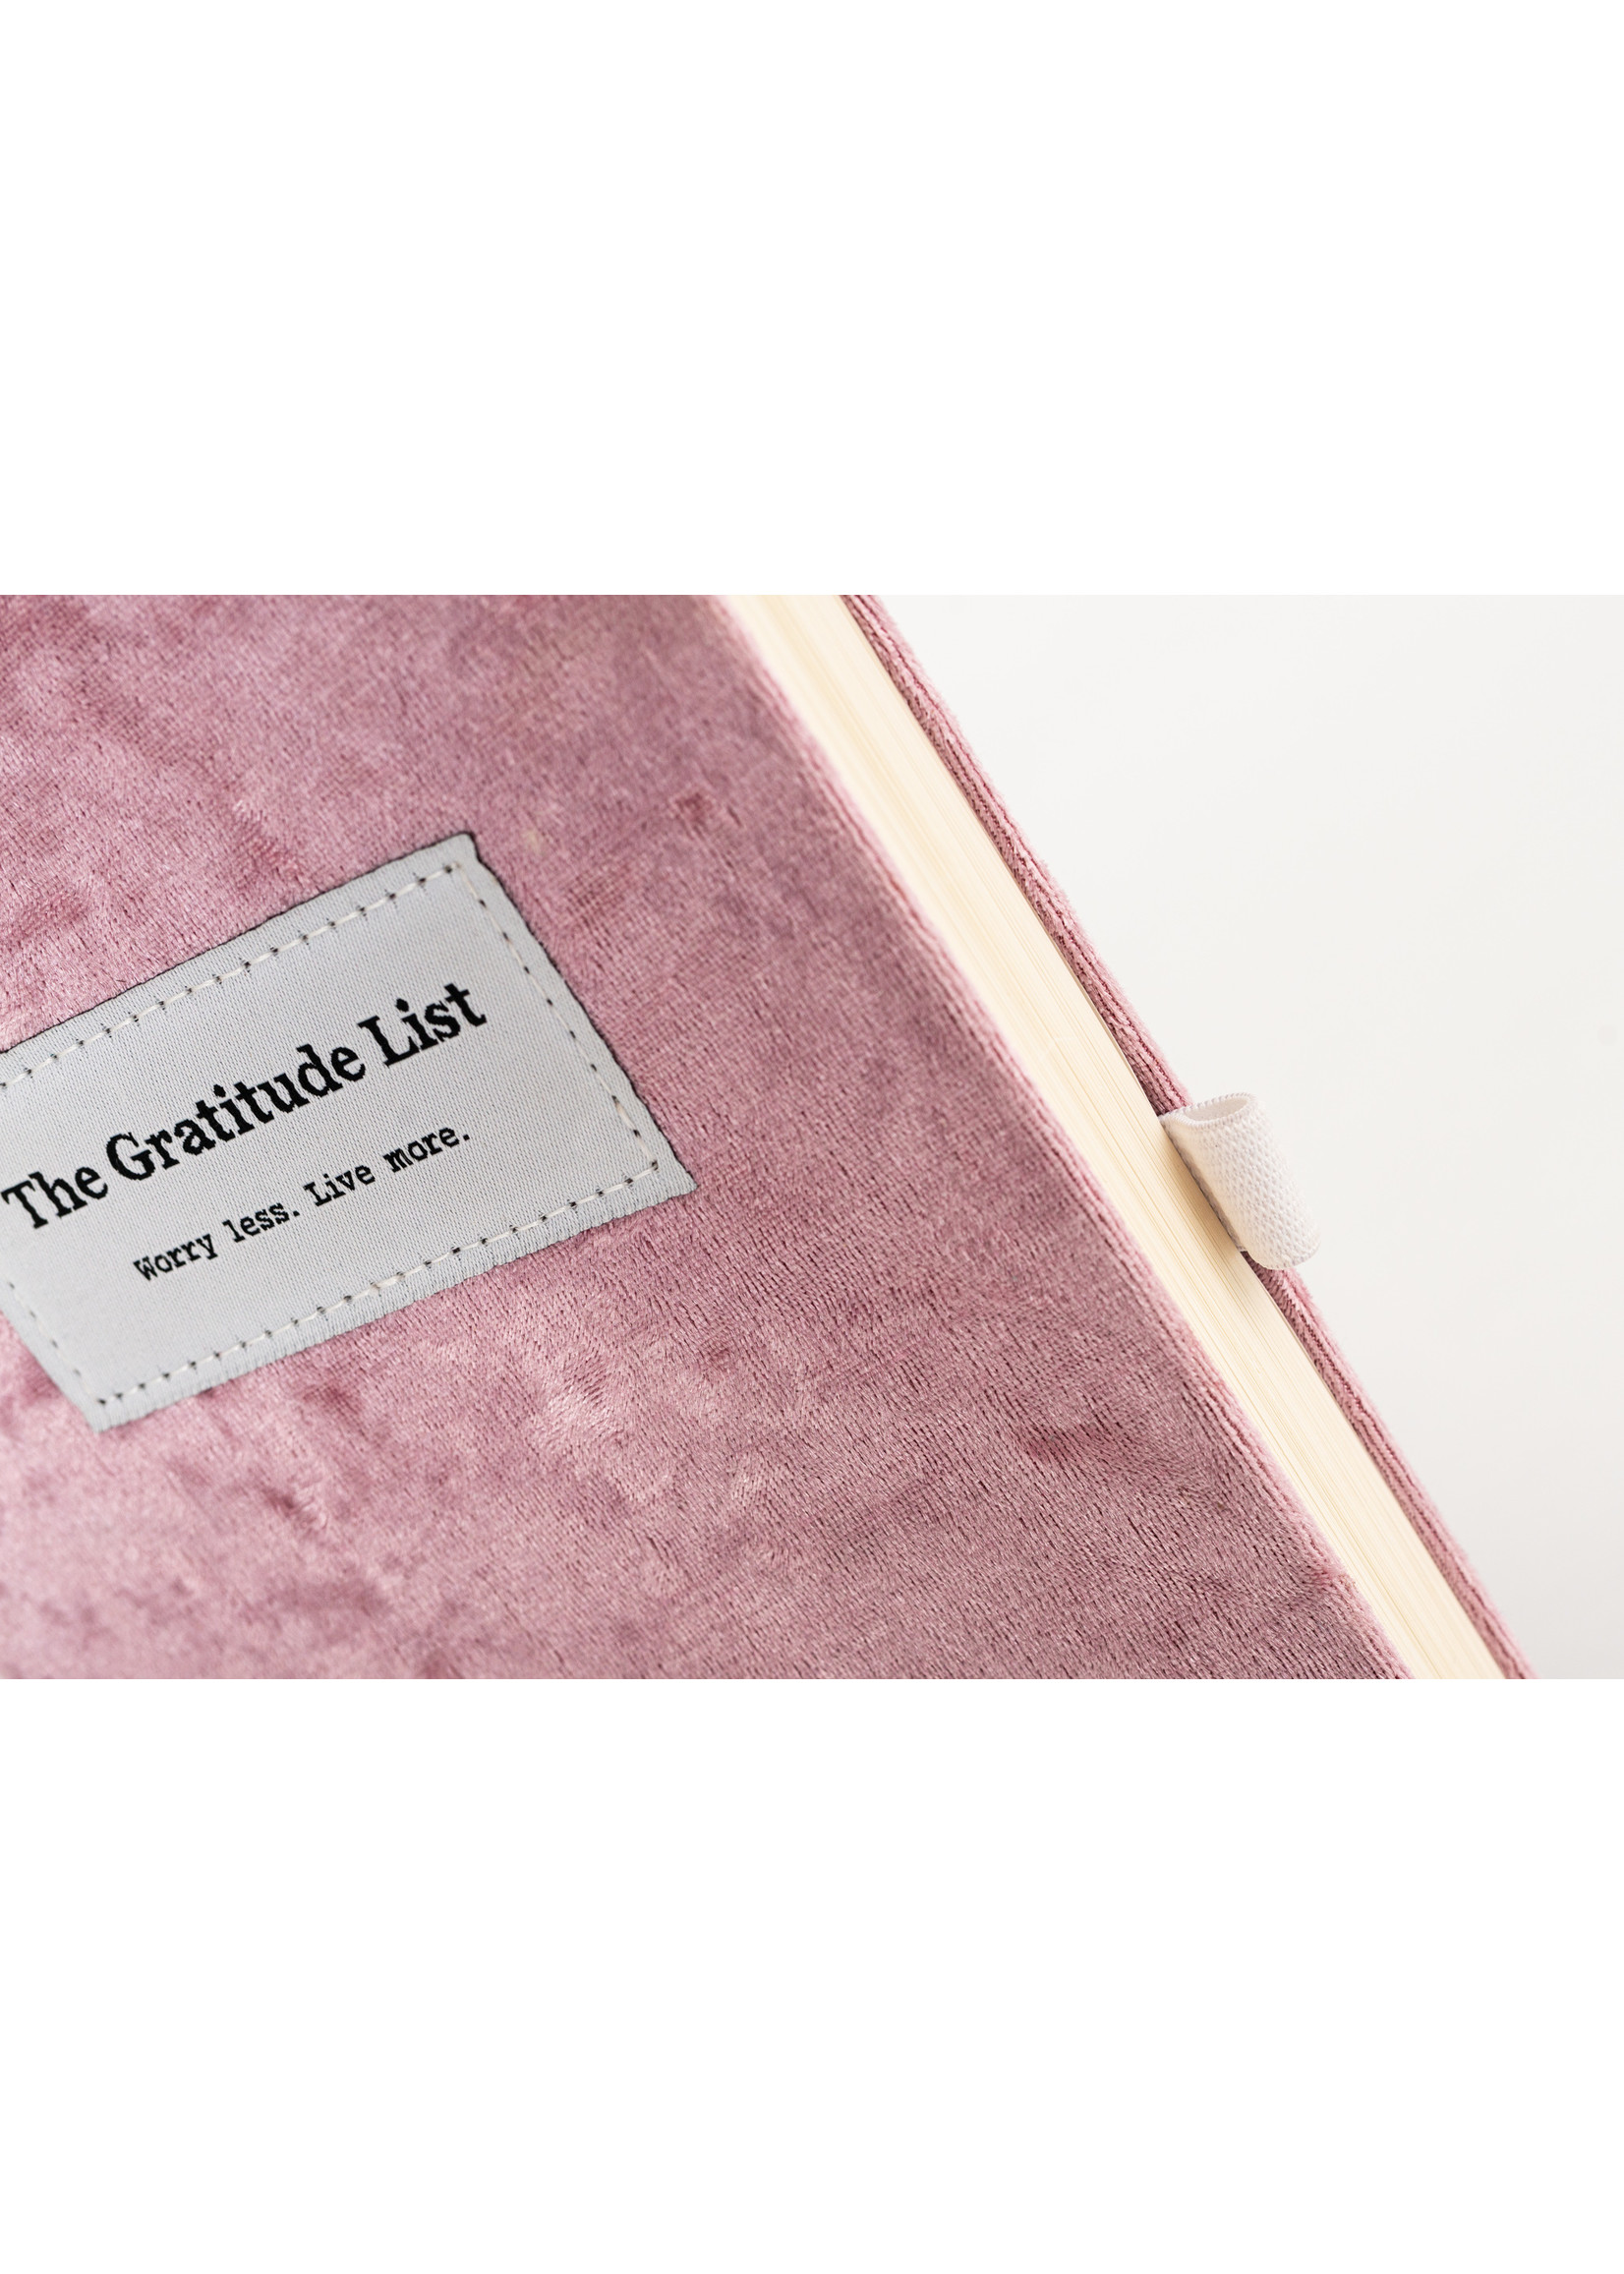 The Gratitude List The Gratitude List - Vintage Rose